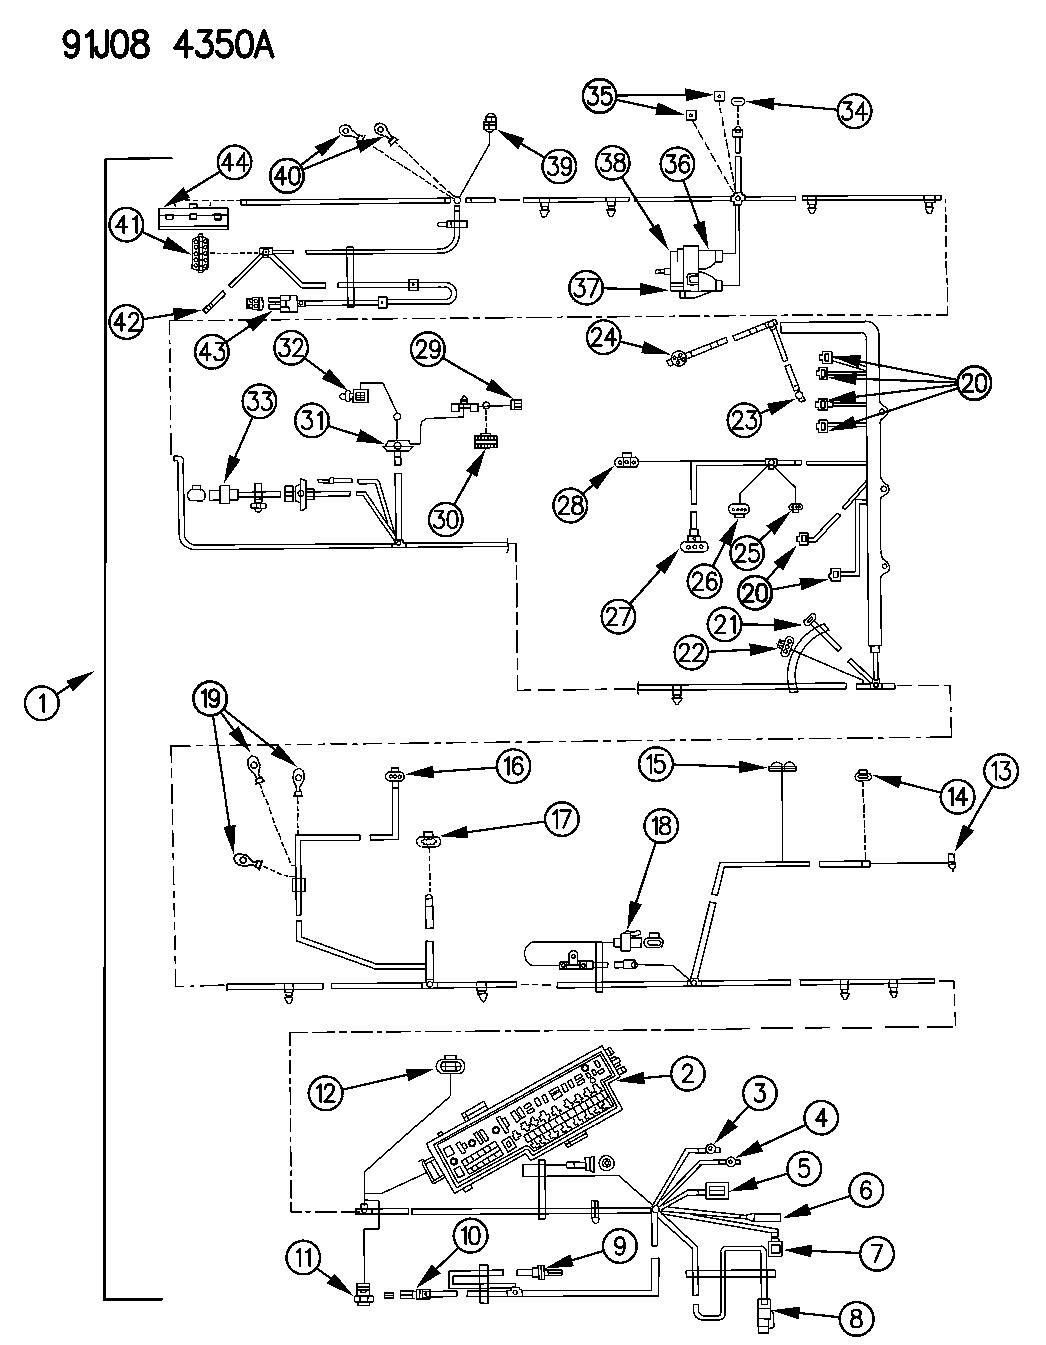 1991 Jeep Comanche Wiring - Headlamp To Dash